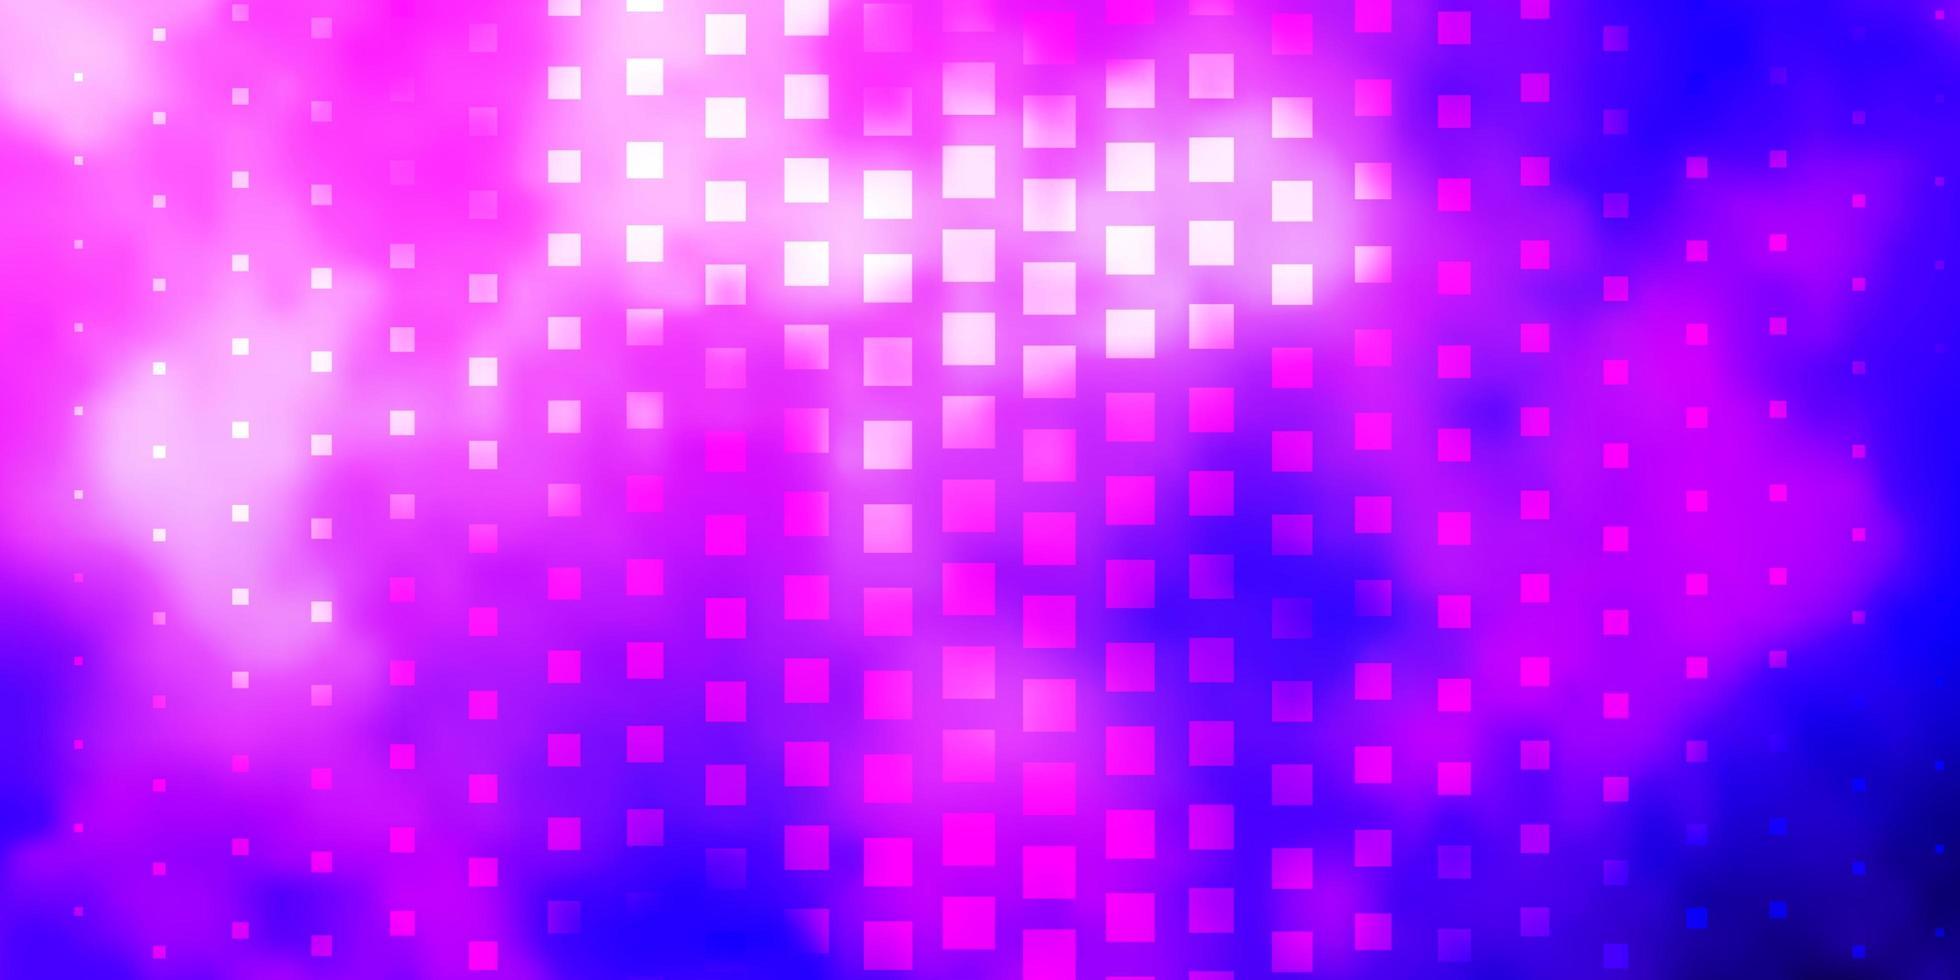 lila mönster i fyrkantig stil. vektor